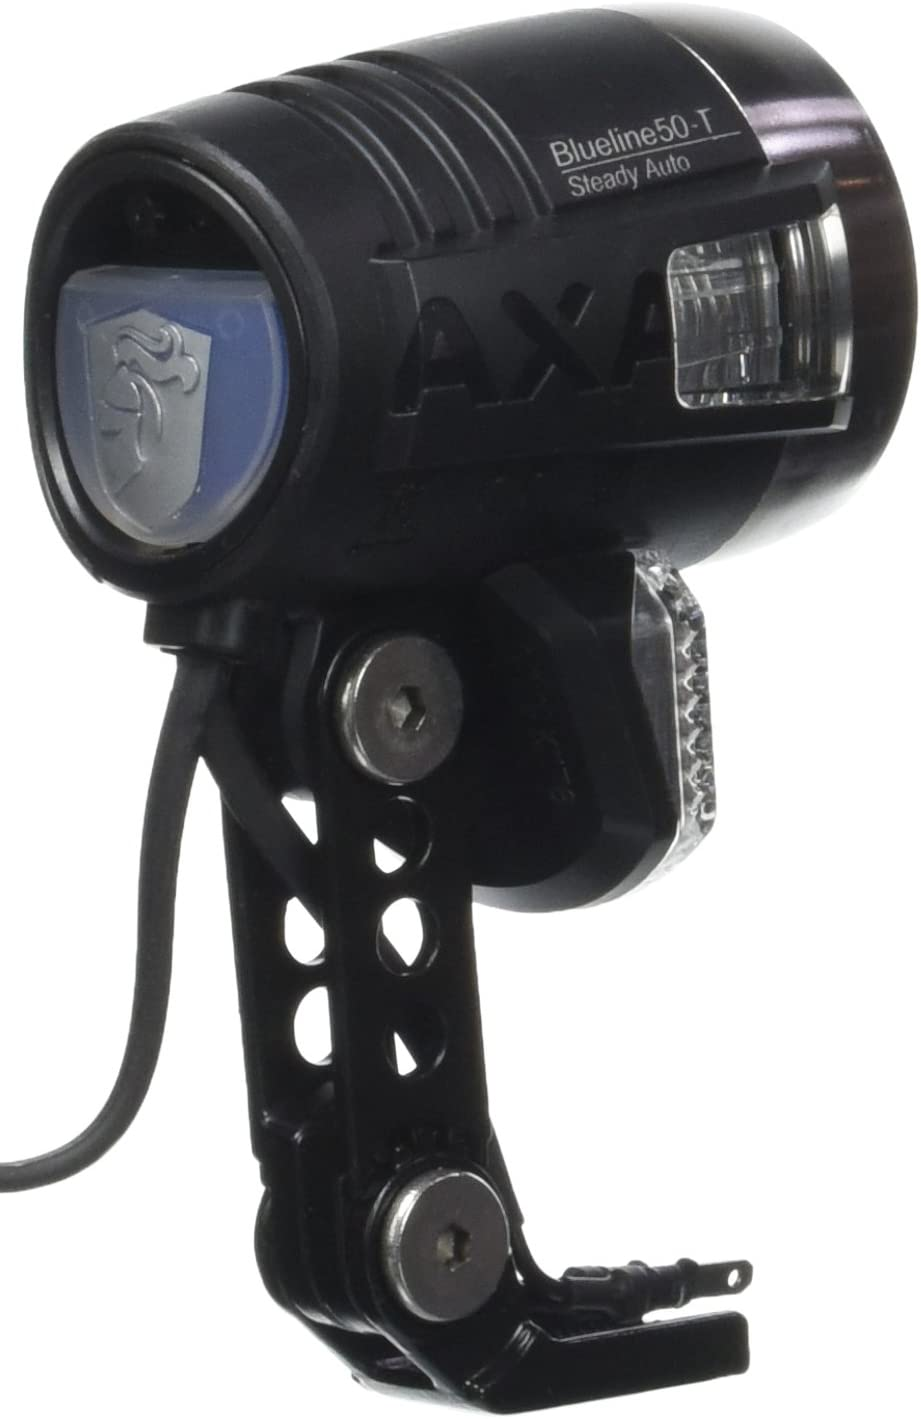 Faros de bicicleta luz axa blueline 50 switch con interruptor para Nabendynamo